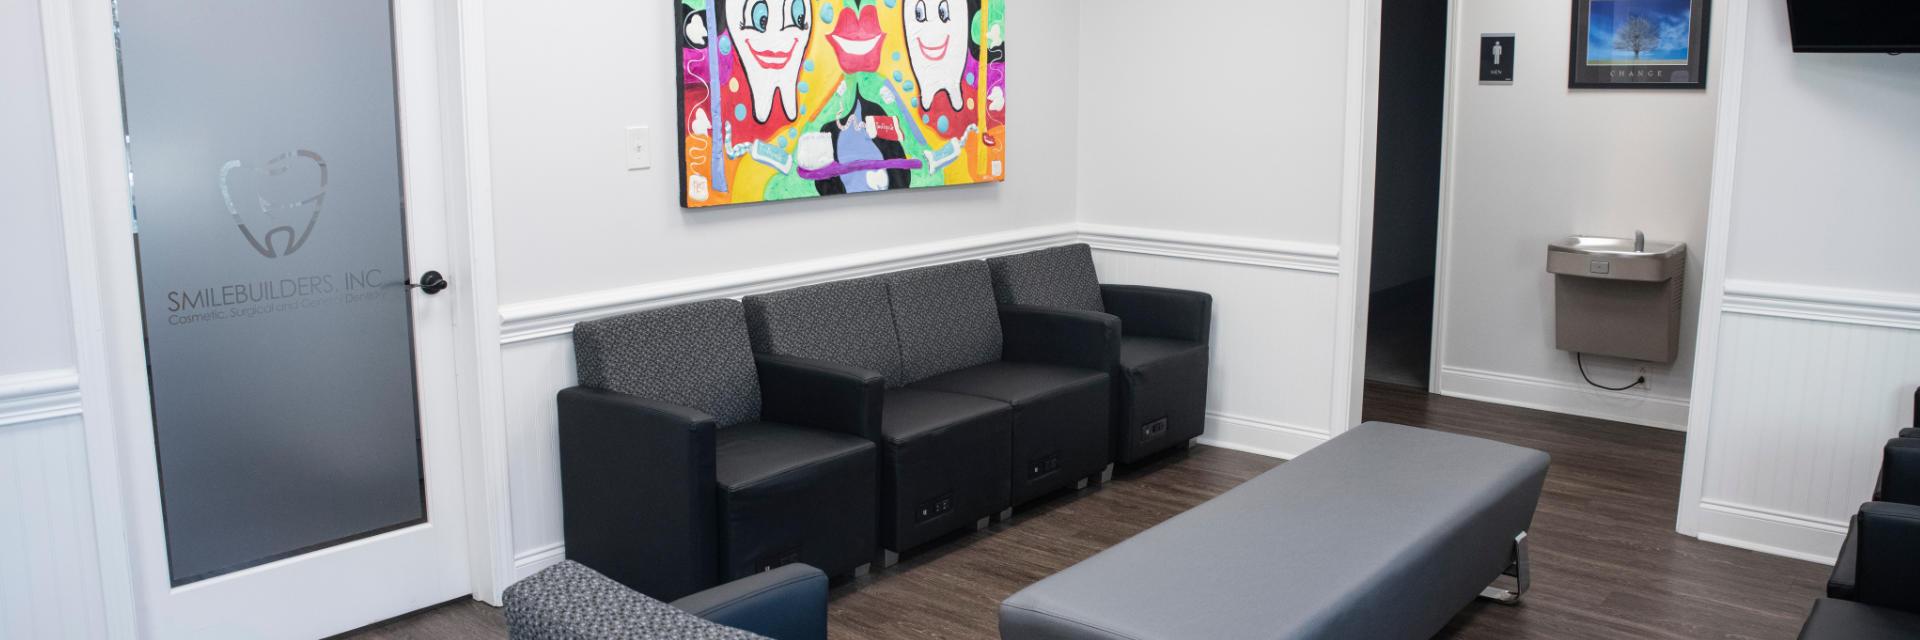 Waiting room at SmileBuilders, Inc.